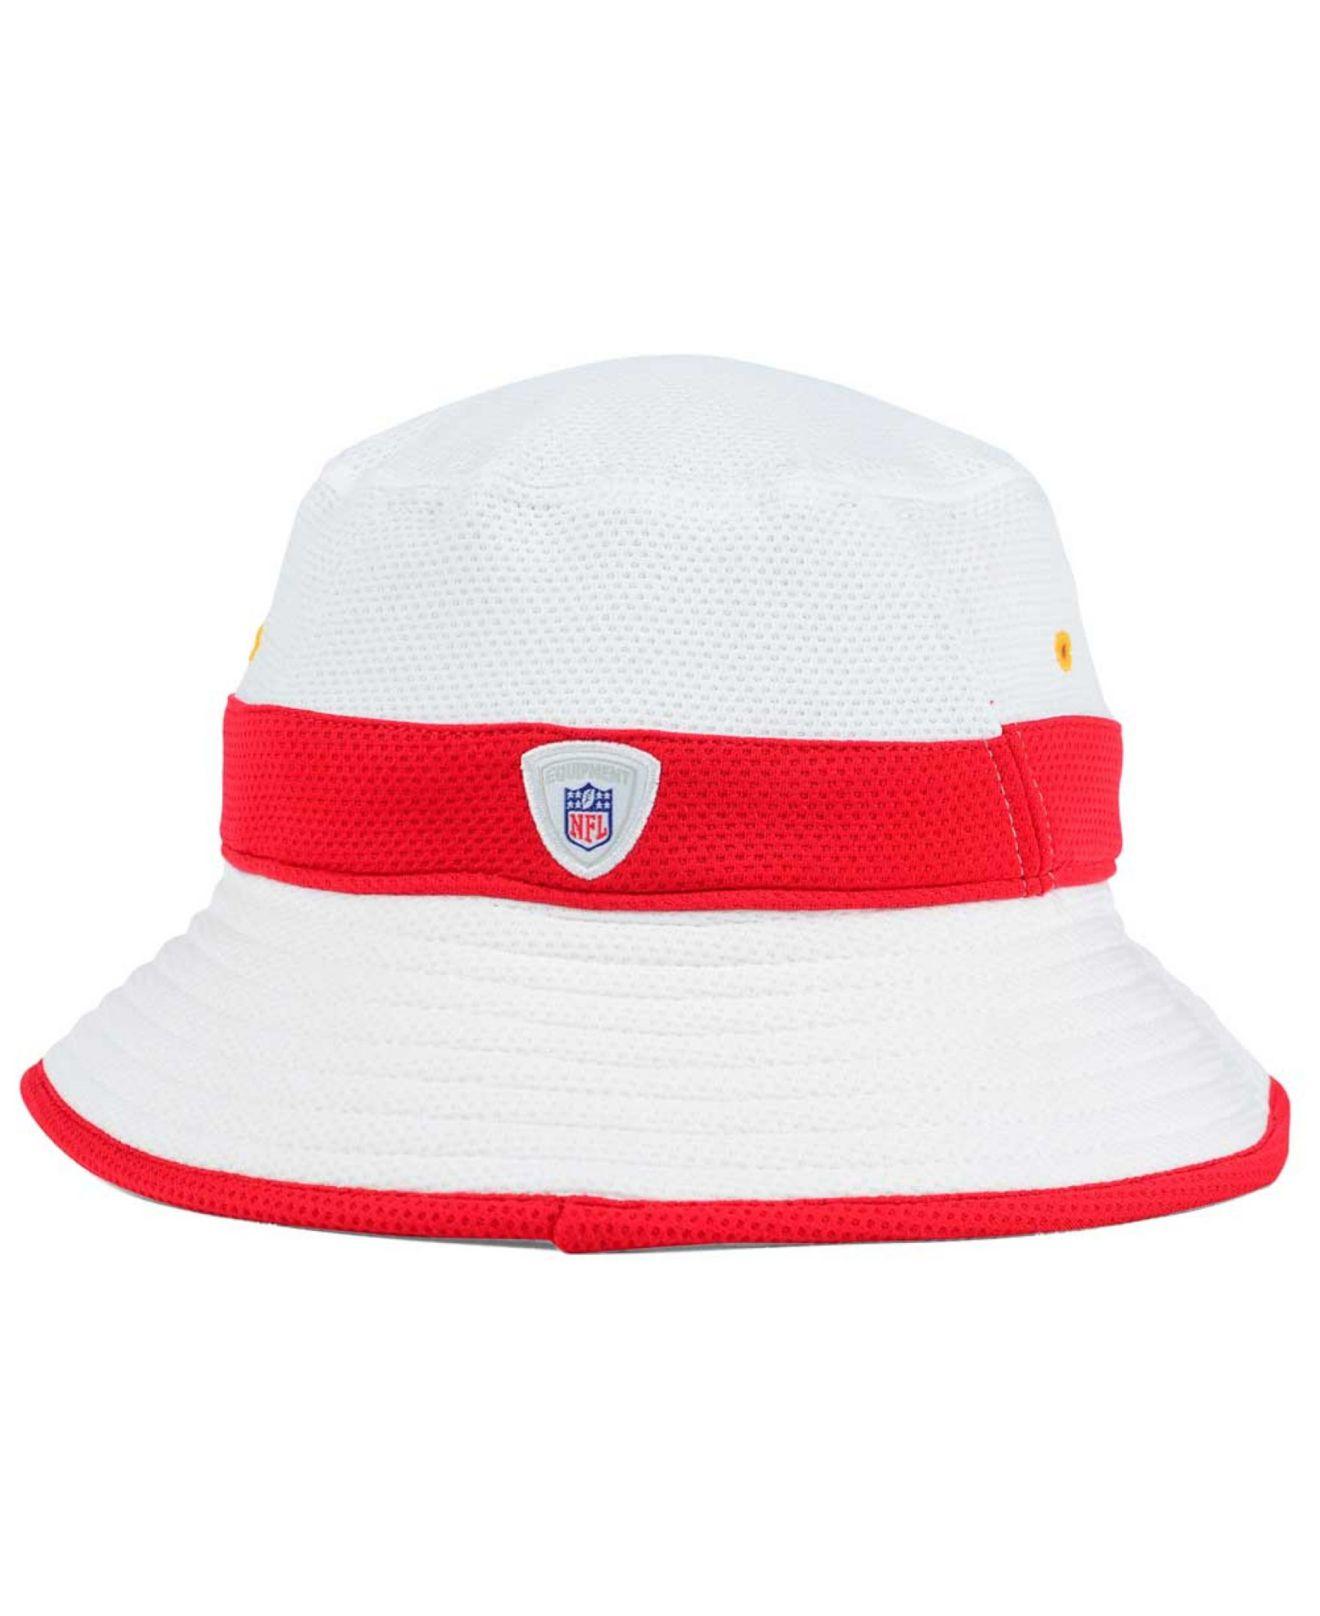 timeless design 5318d d6bbc KTZ Kansas City Chiefs Training Camp Official Bucket Hat in White ...